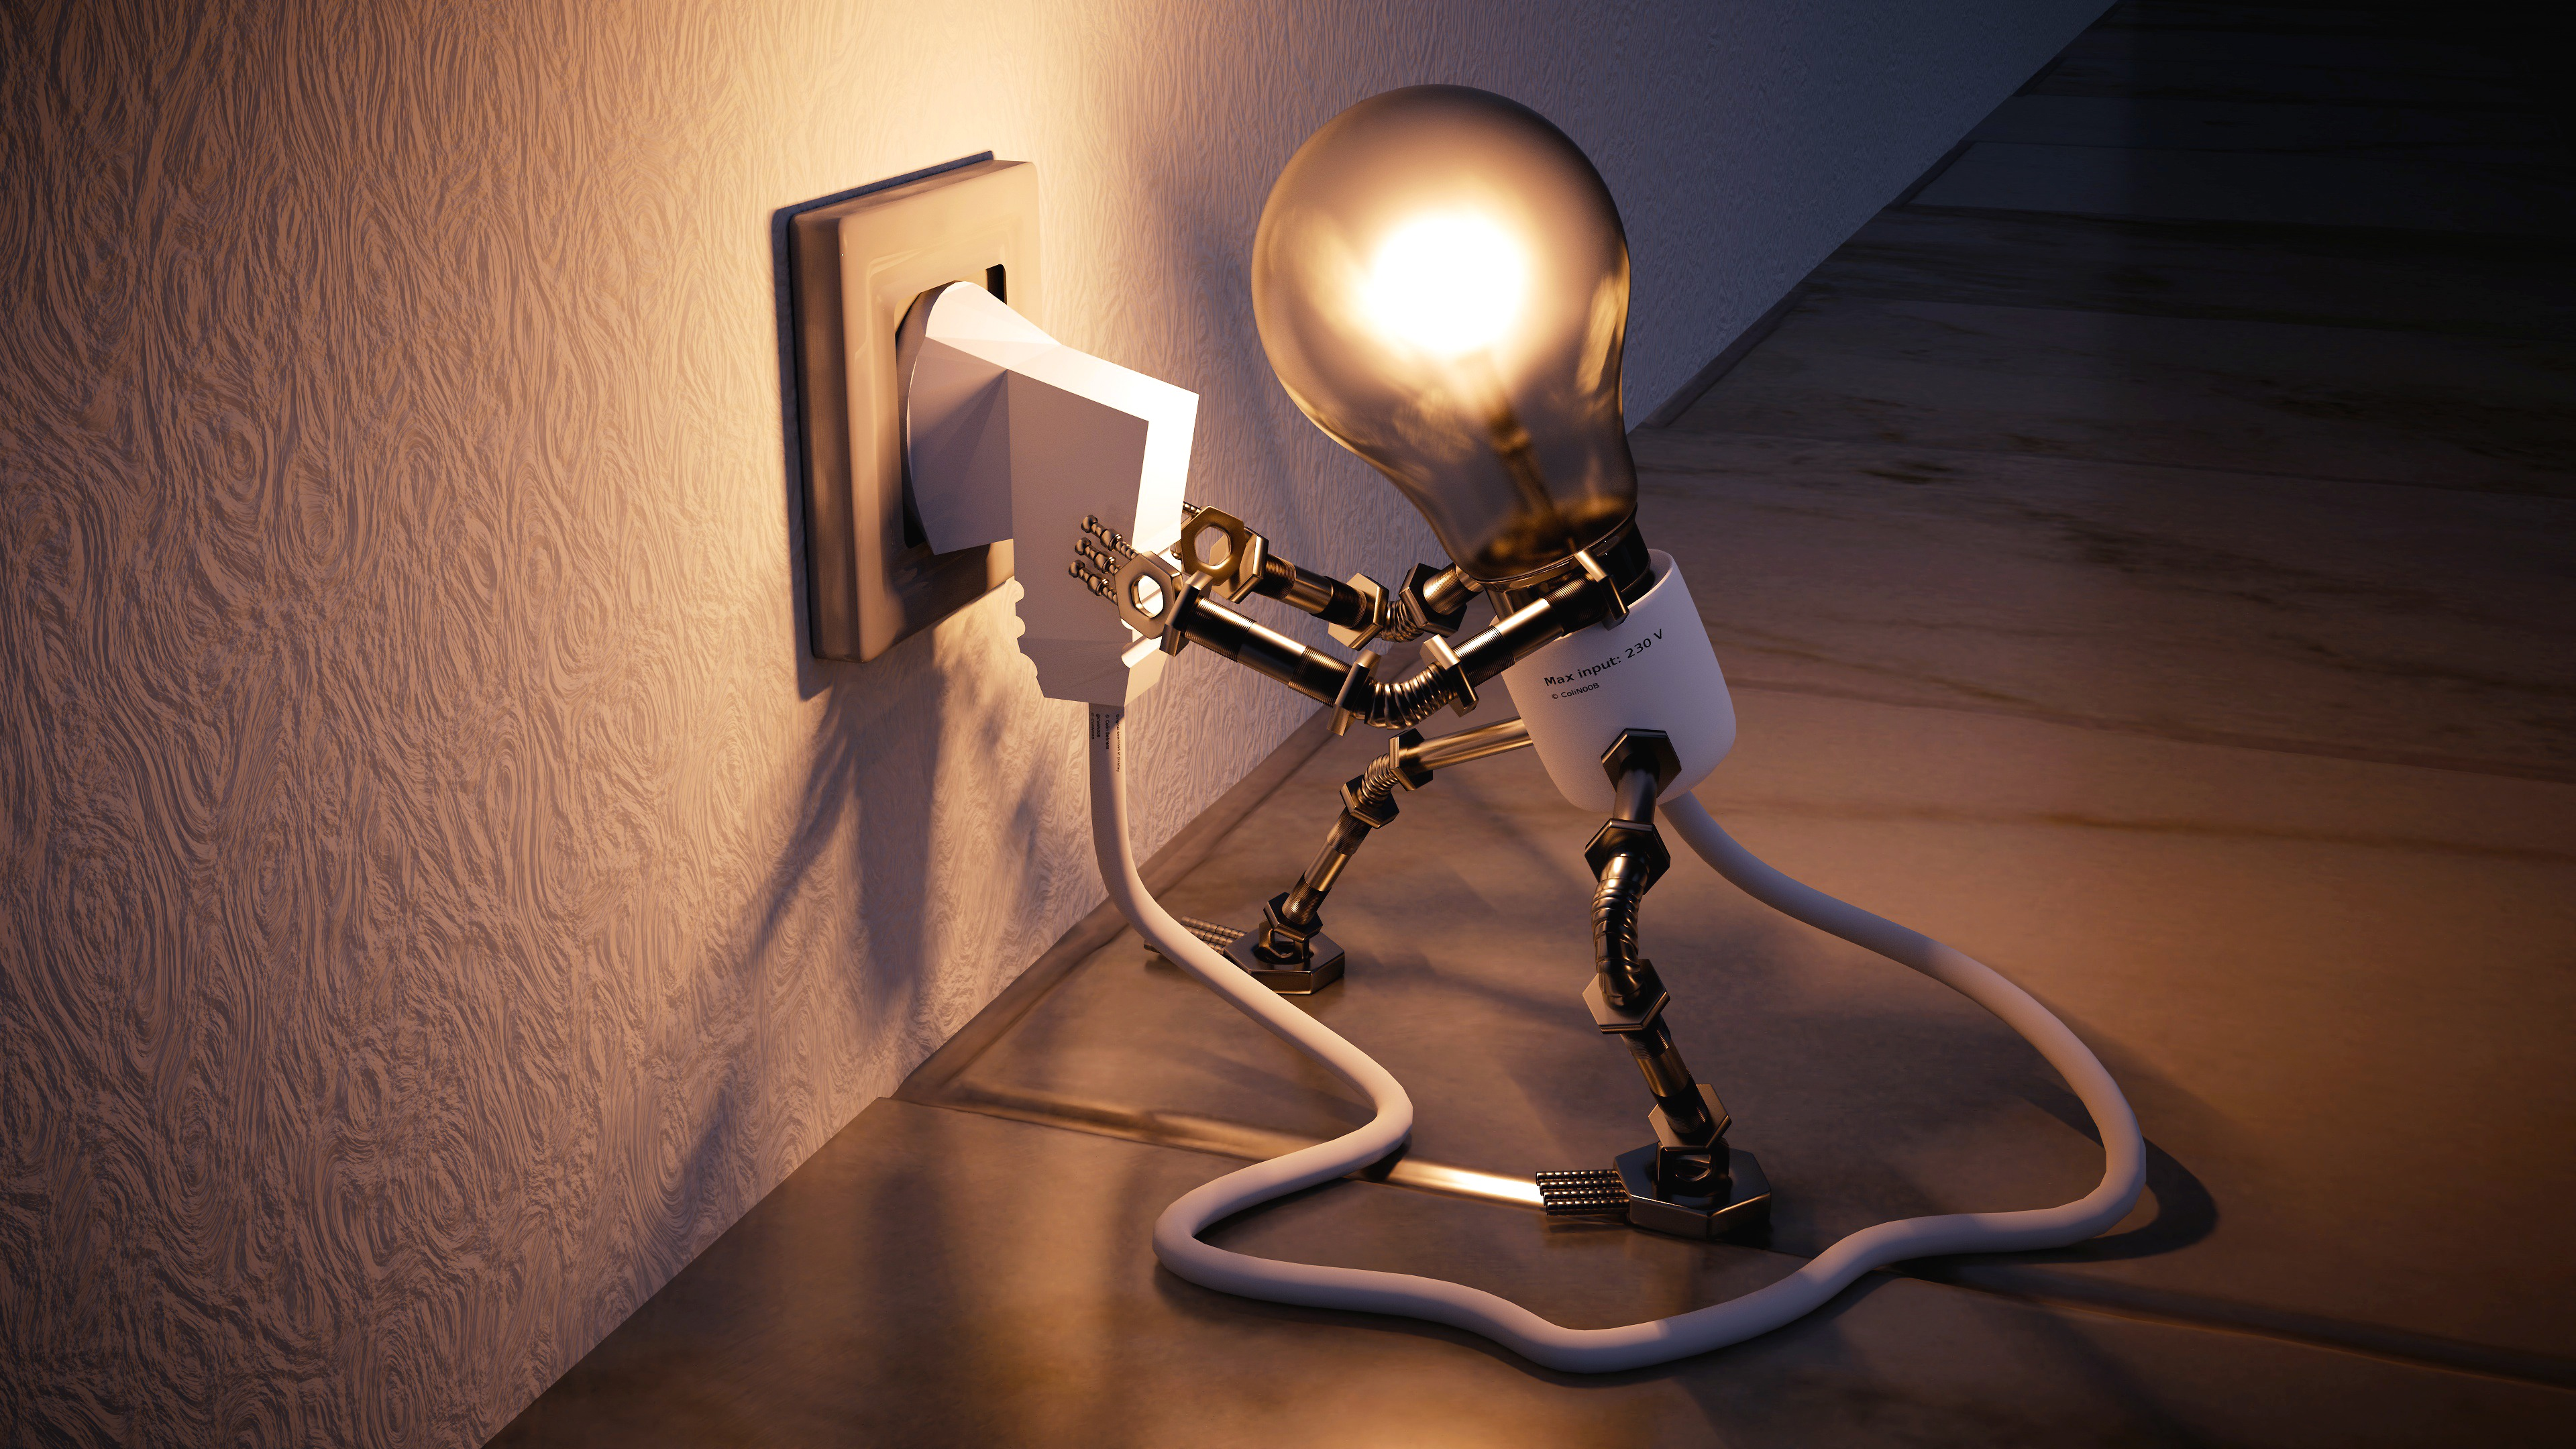 Smart Light bulb unplug himself wallpaper